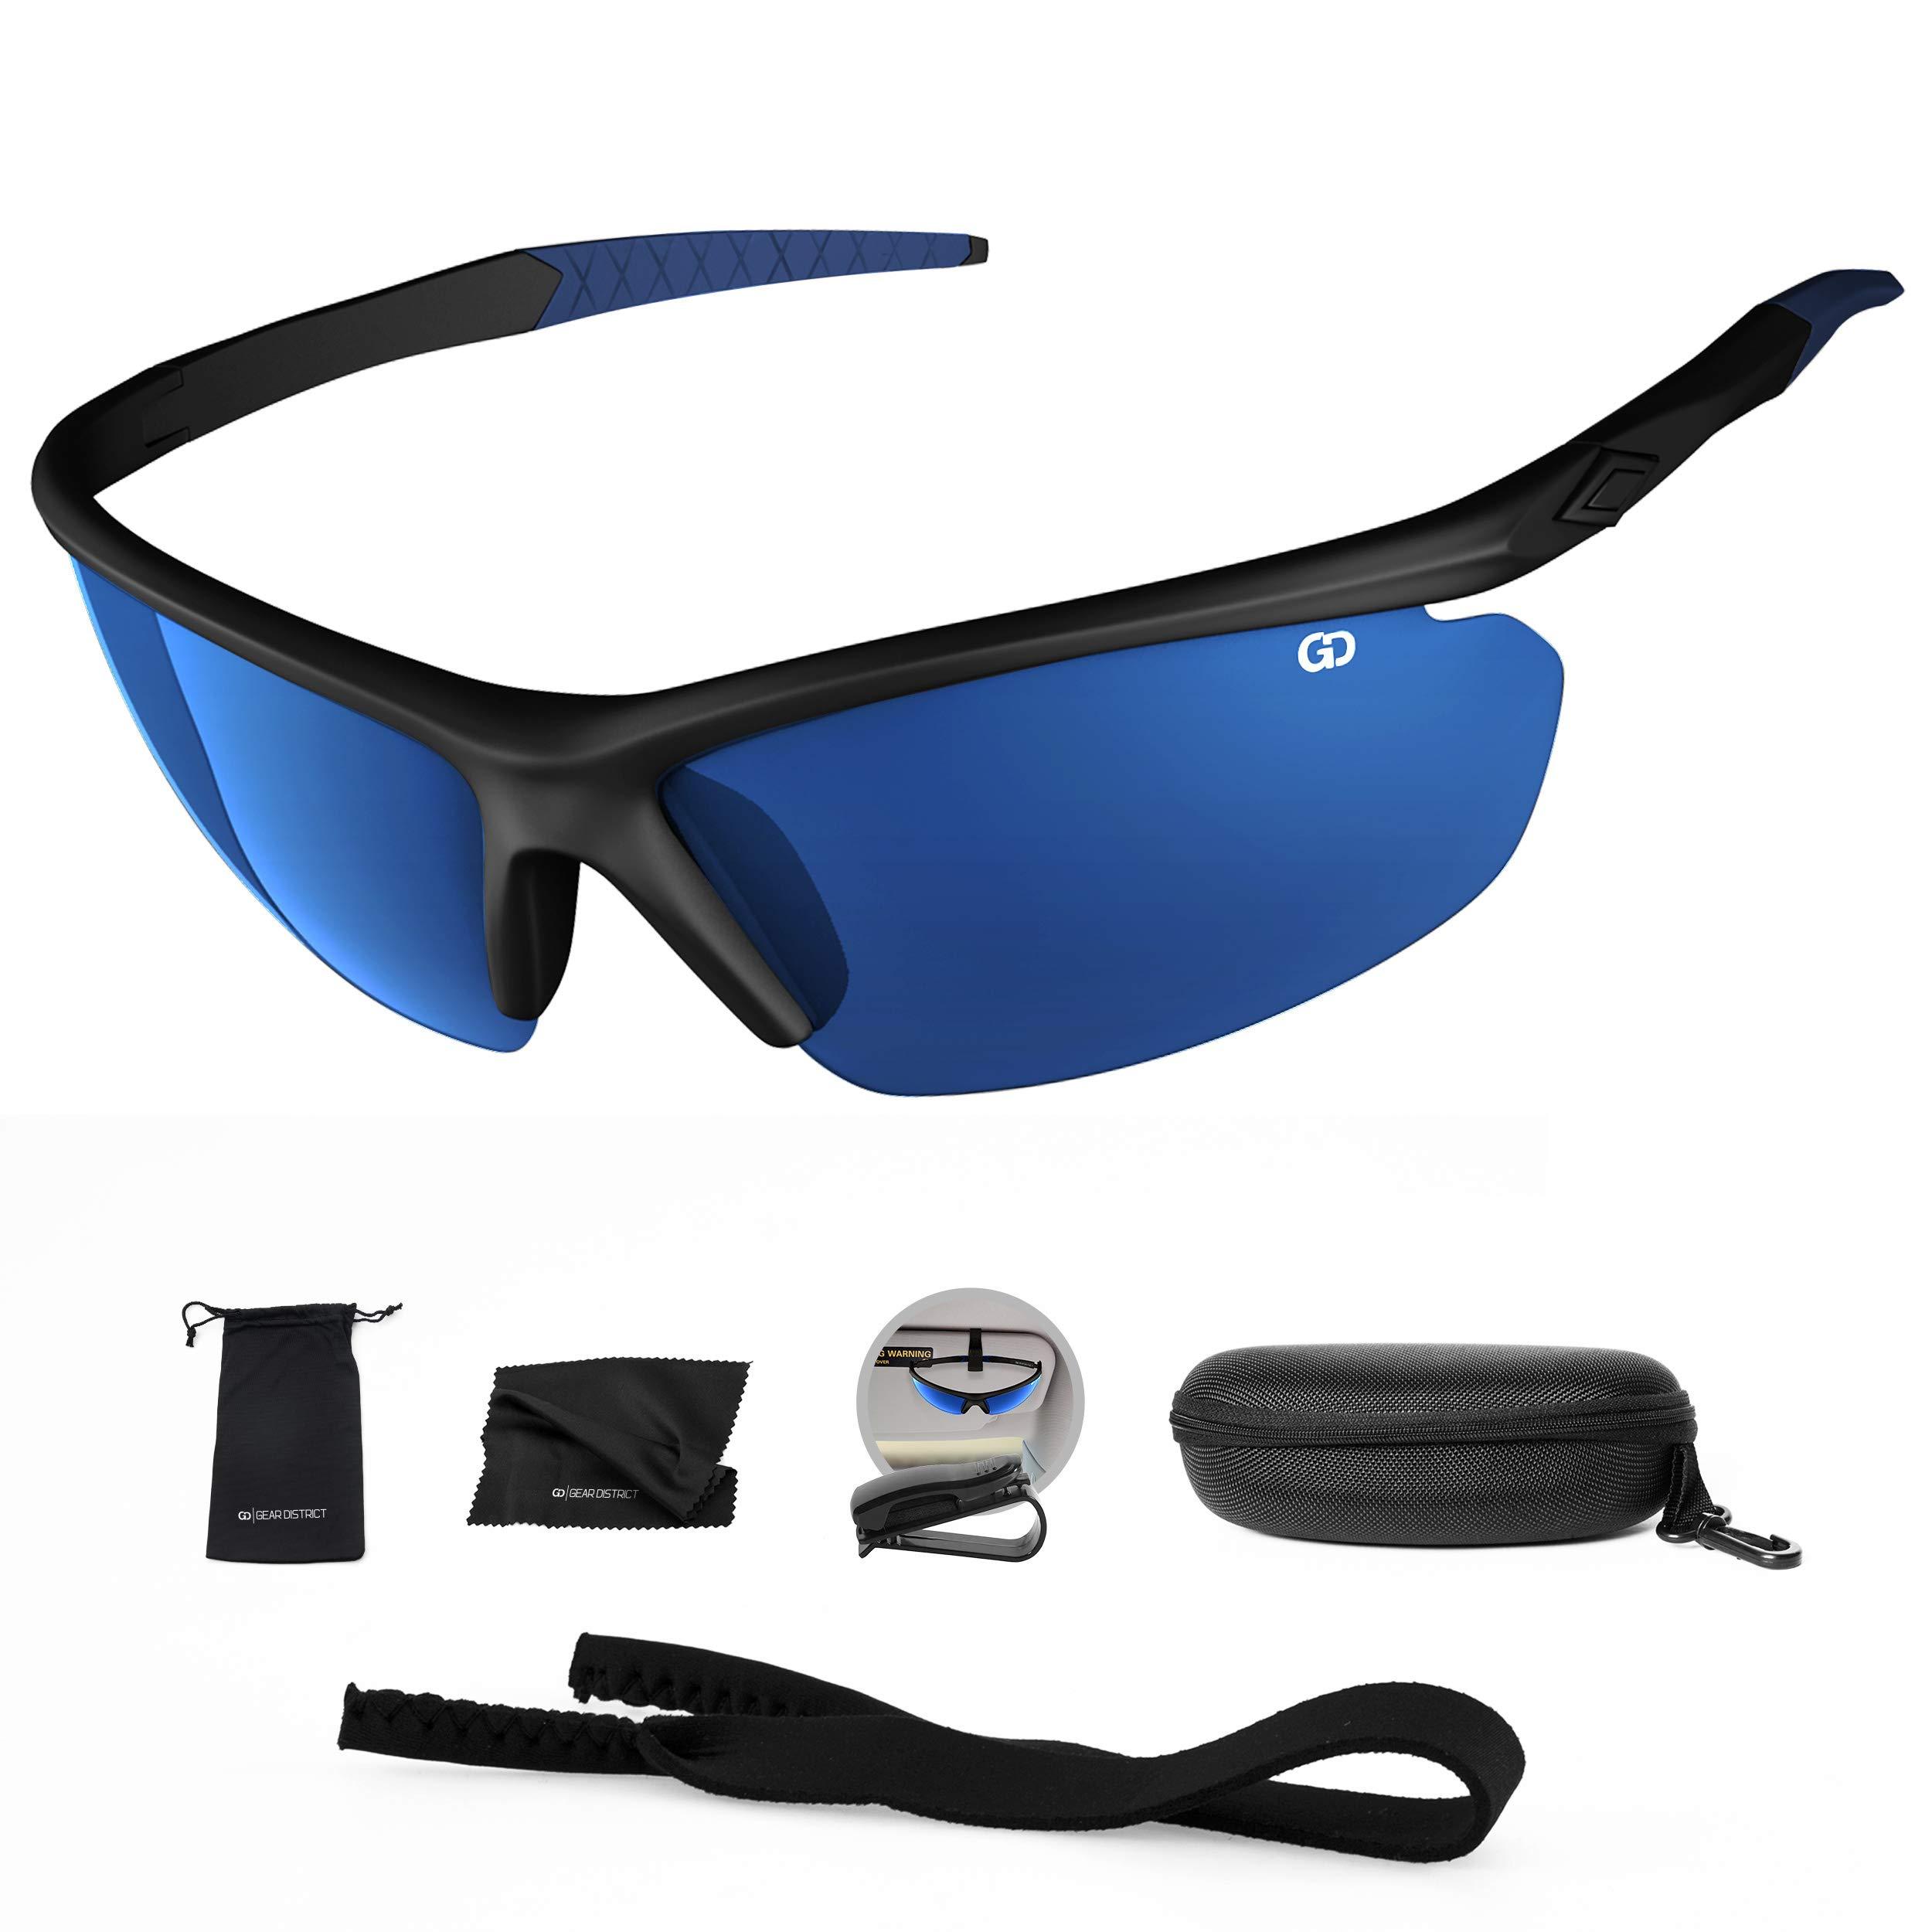 Polarized UV400 Sport Sunglasses Anti-Fog Ideal for Driving or Sports Activity (Black, Mirror Blue)